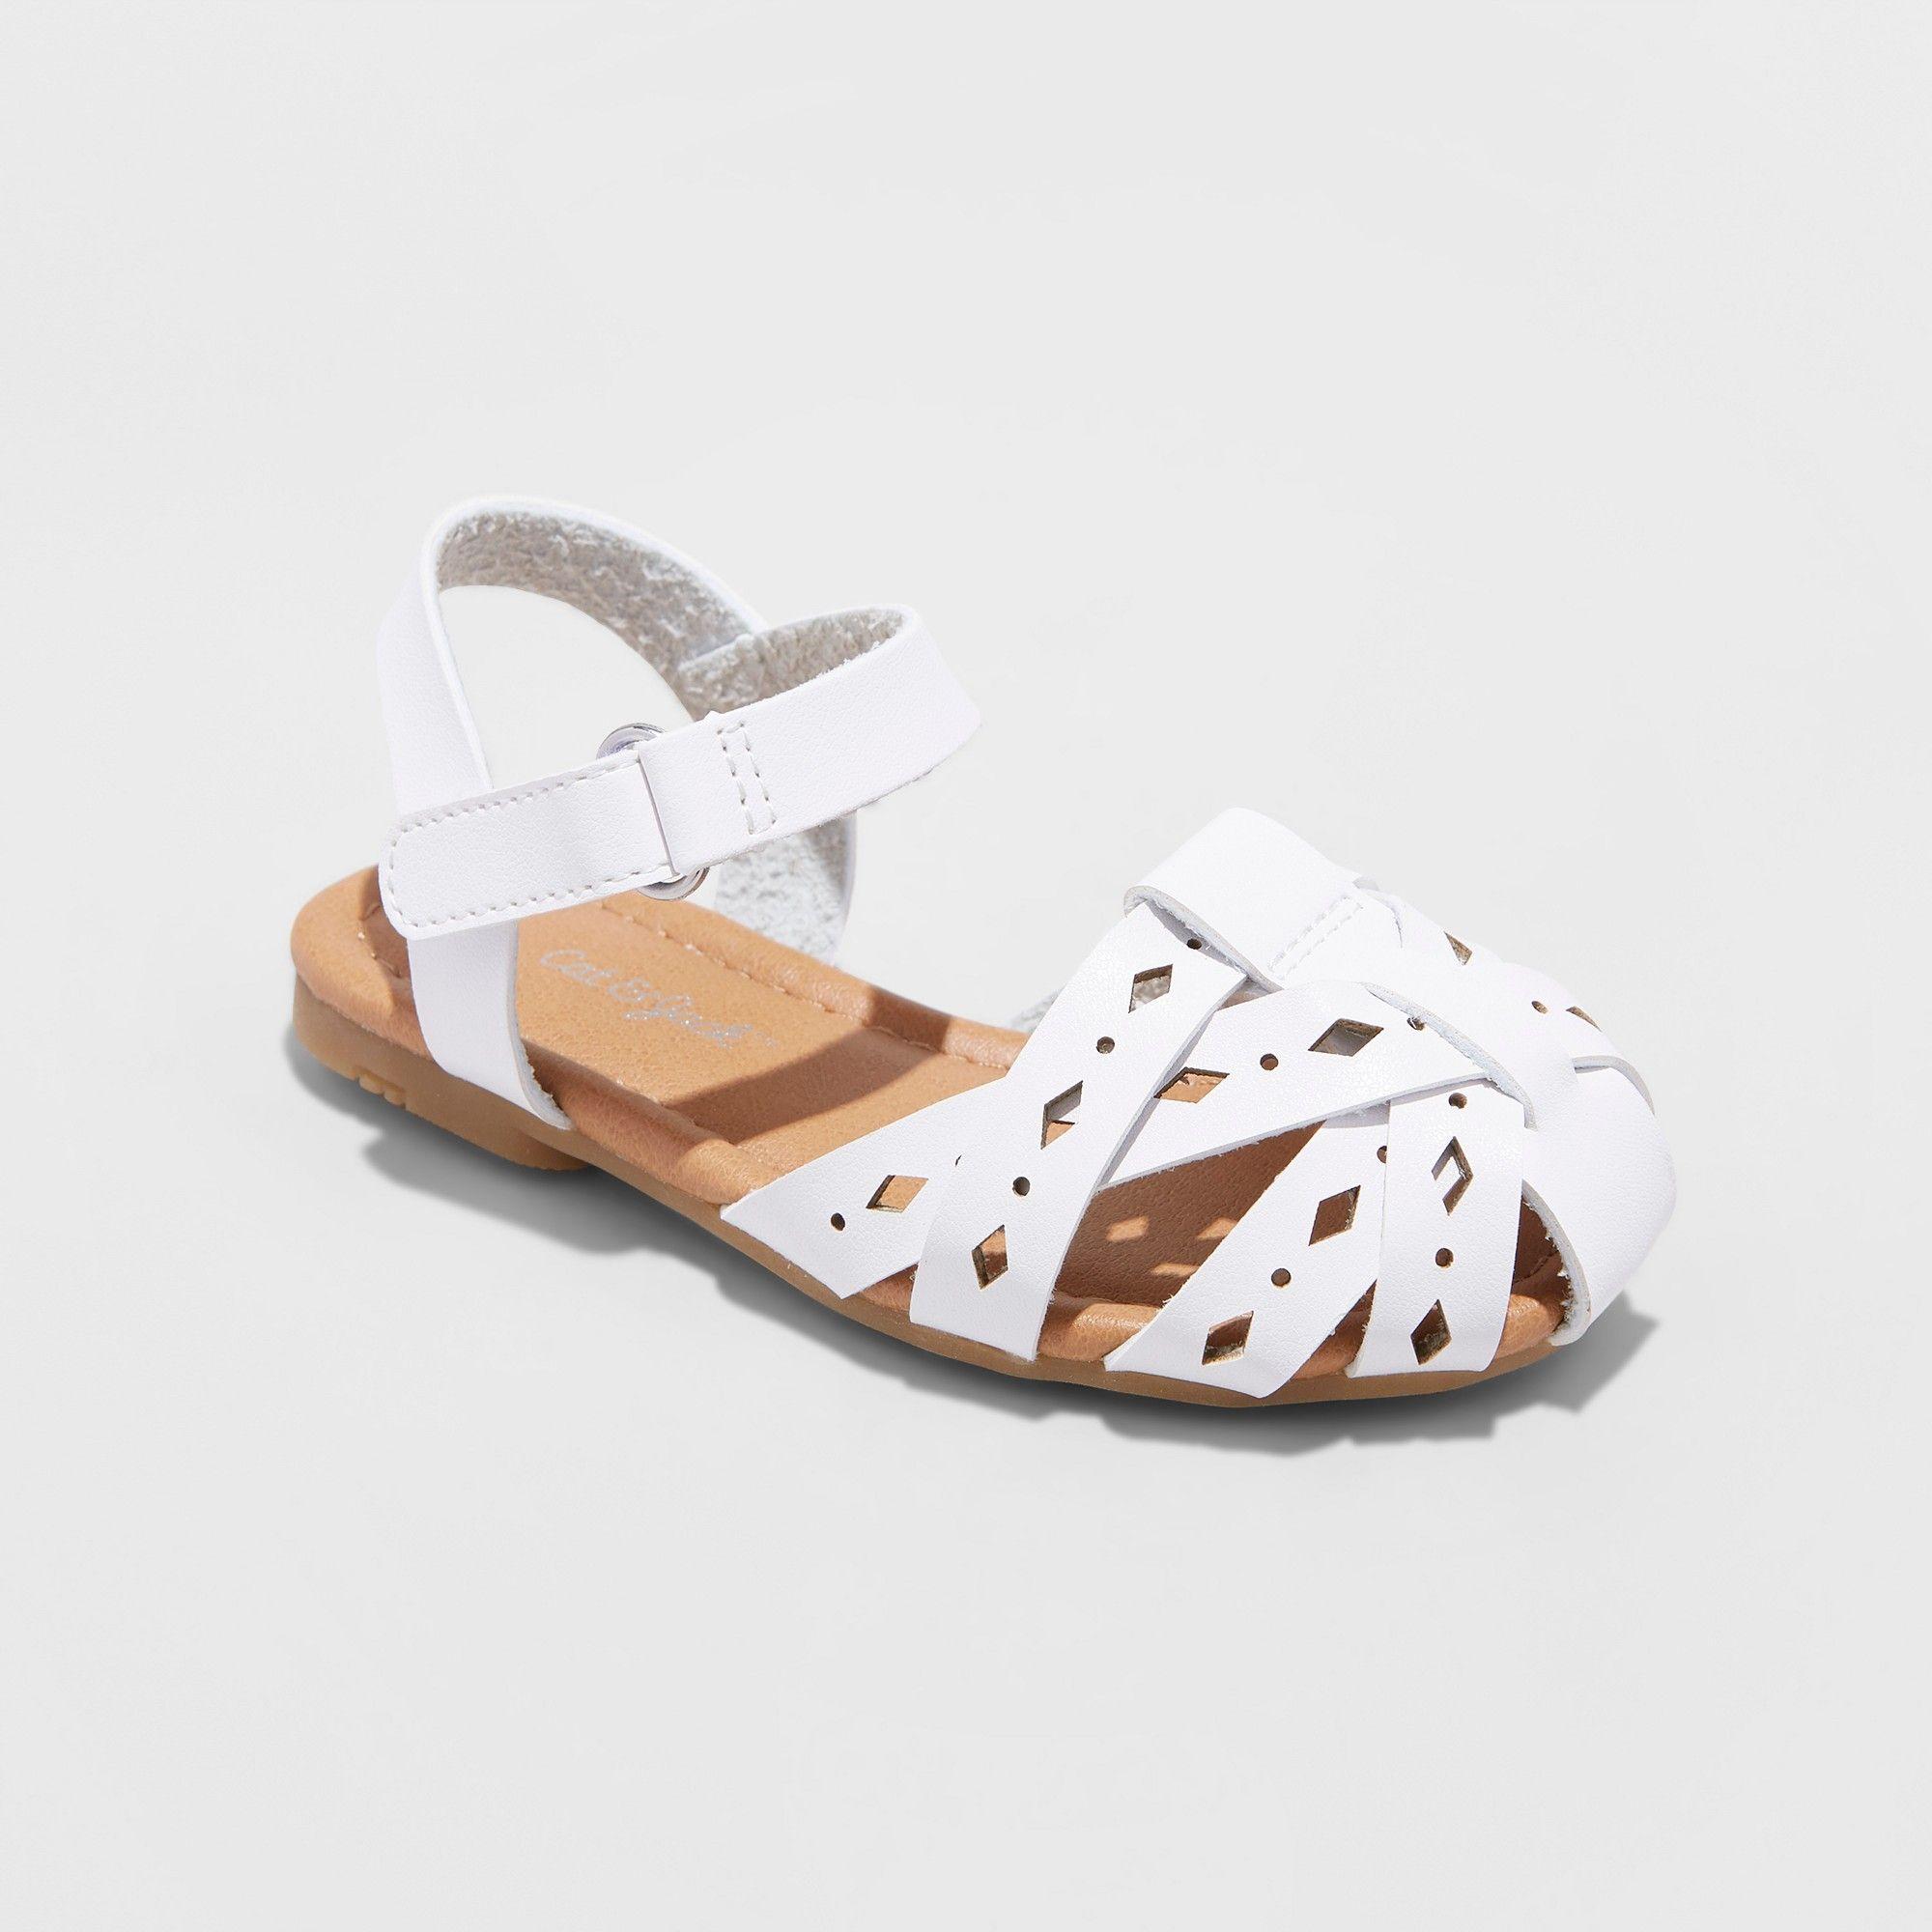 a8aa714a79a0 Toddler Girls' Elysia Huarache Sandals - Cat & Jack White 7 ...